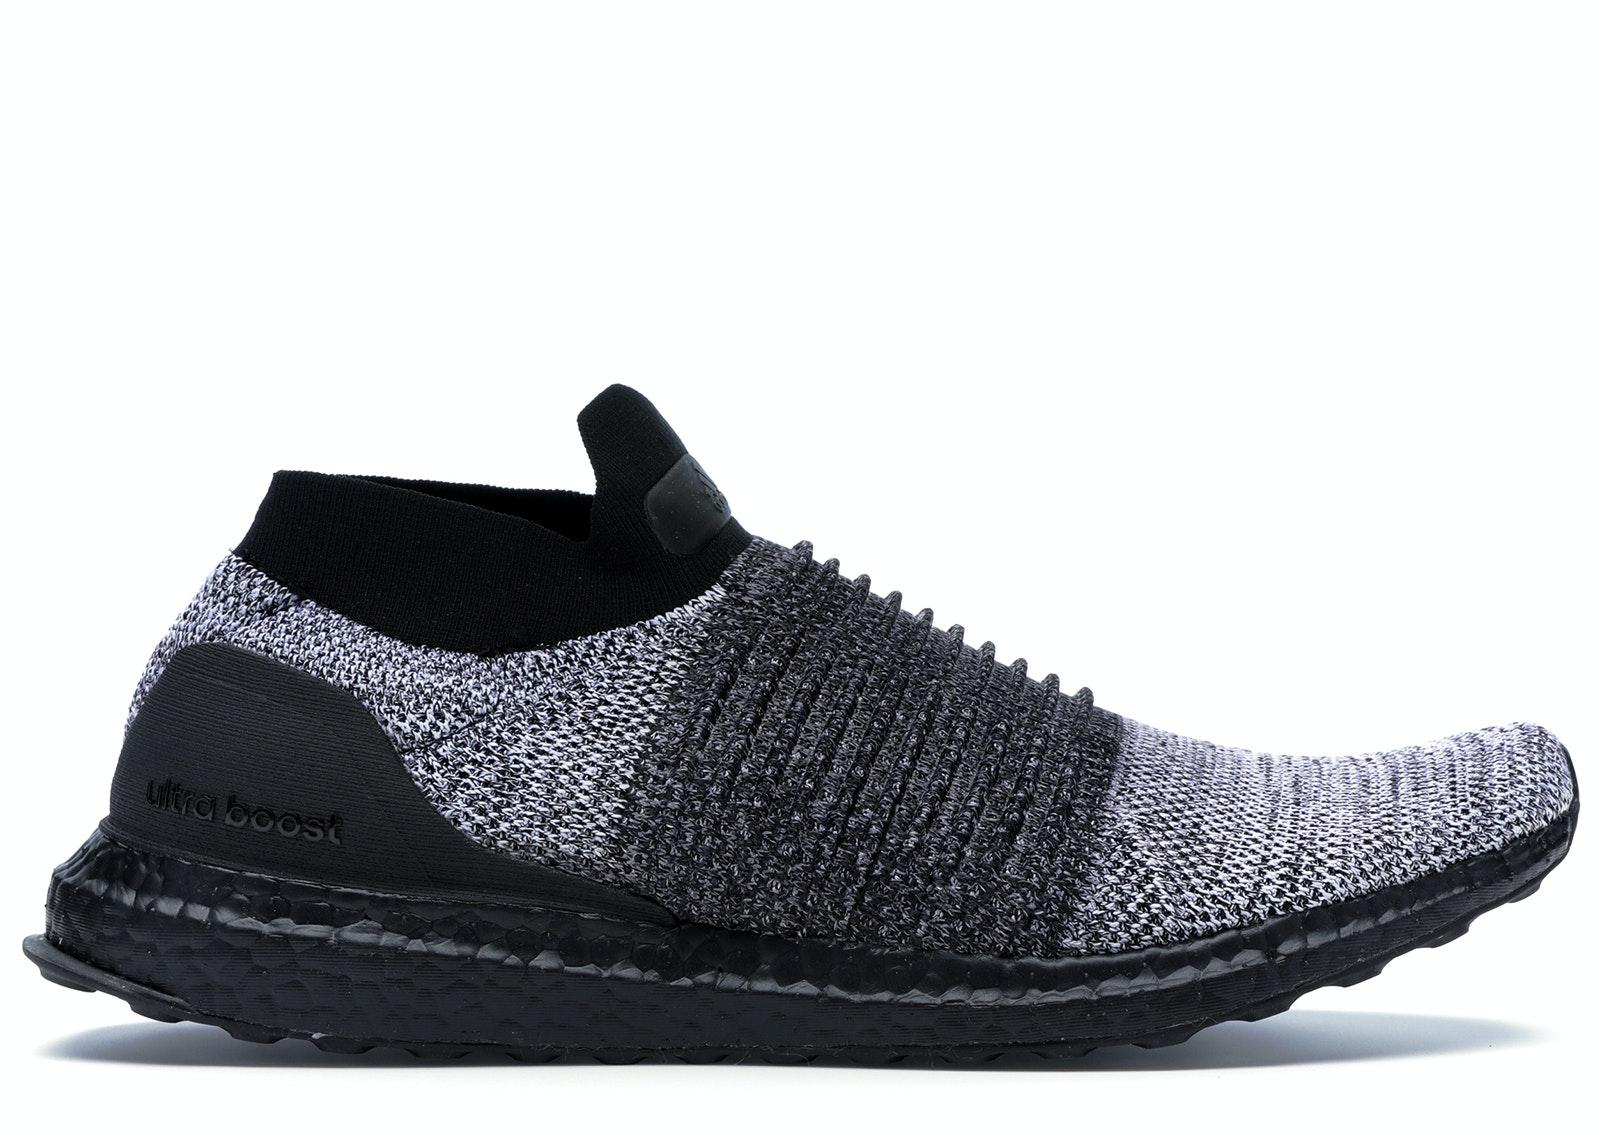 adidas Ultra Boost Laceless Mid Black Oreo